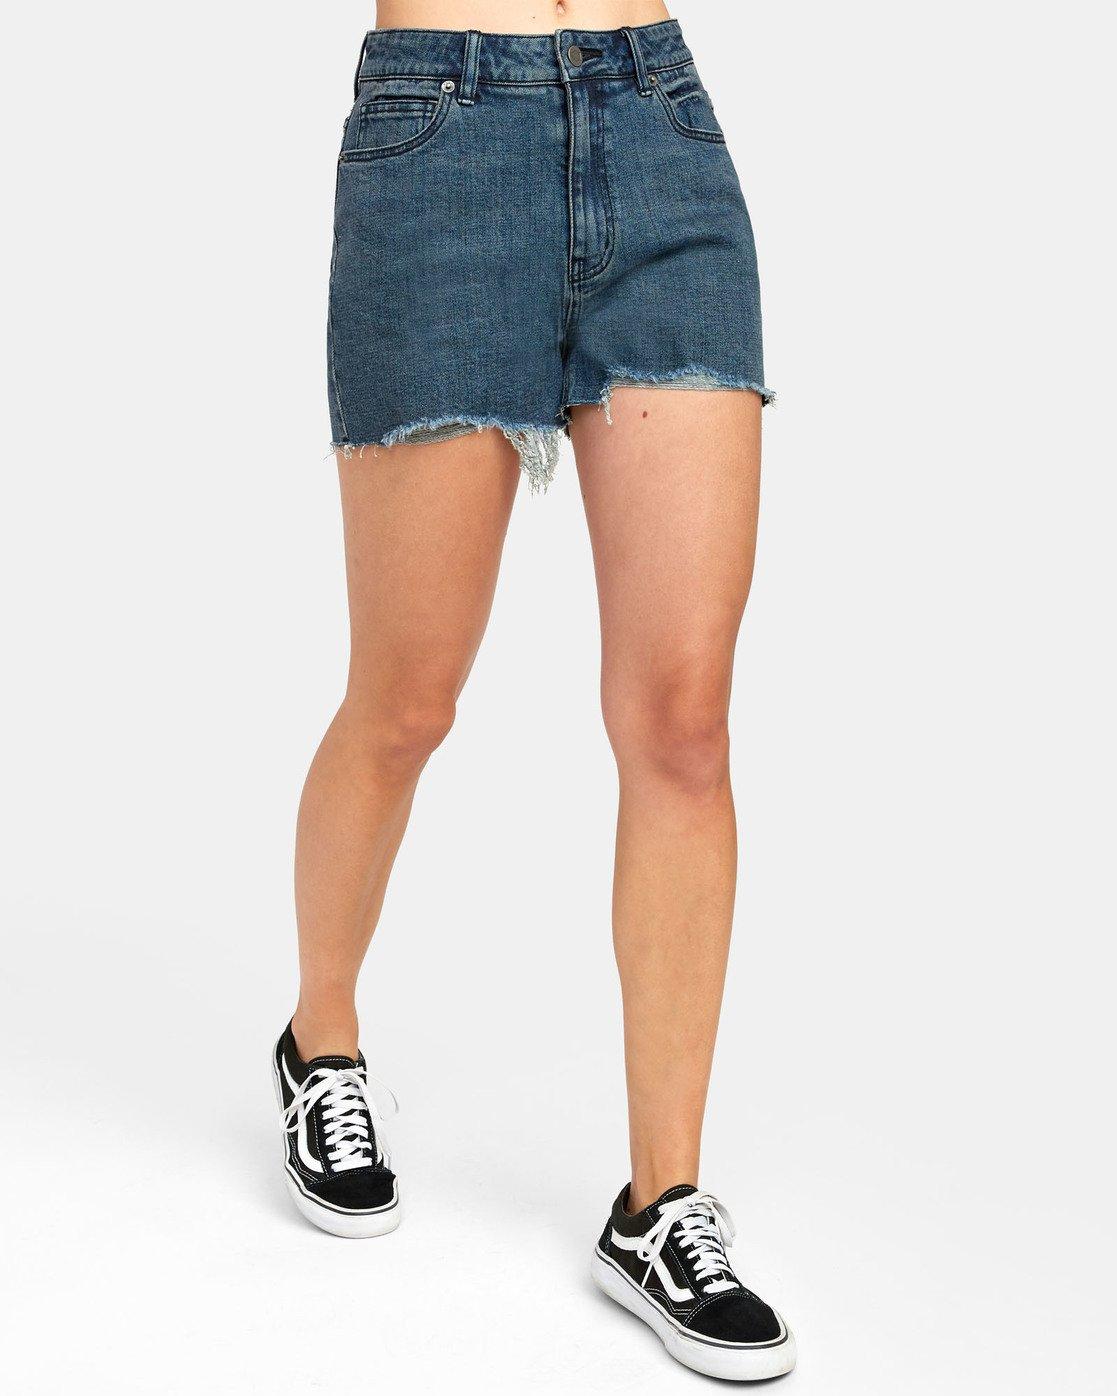 6 Channel - Shorts für Damen  S3WKRCRVP0 RVCA